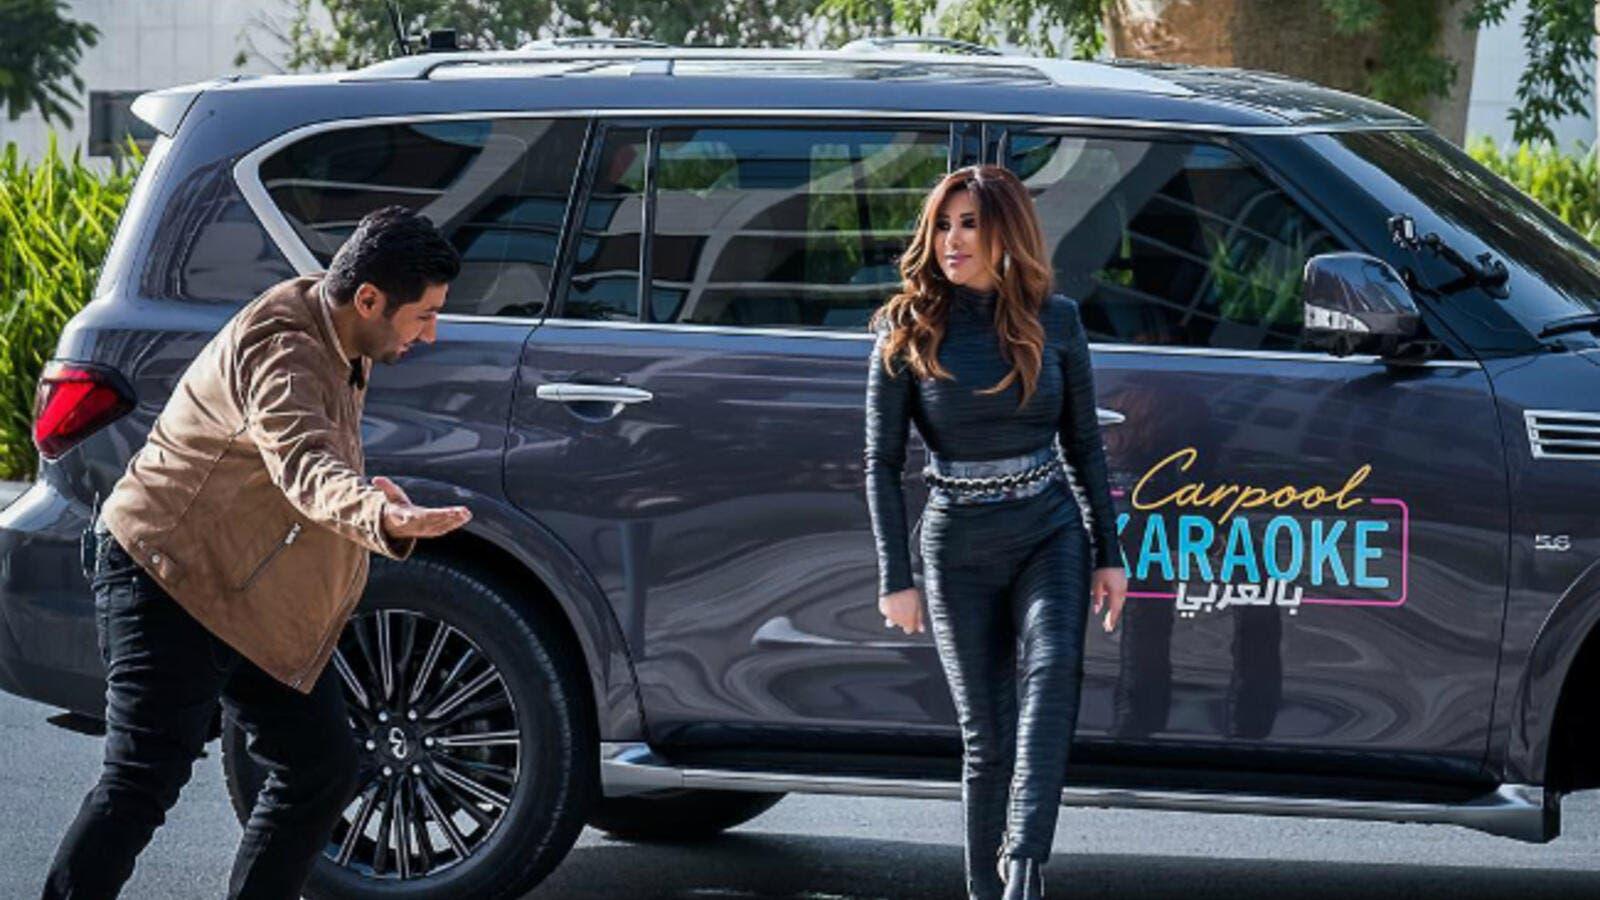 Najwa Karam Suddenly Withdraws From Car Pool Karaoke Arabia Al